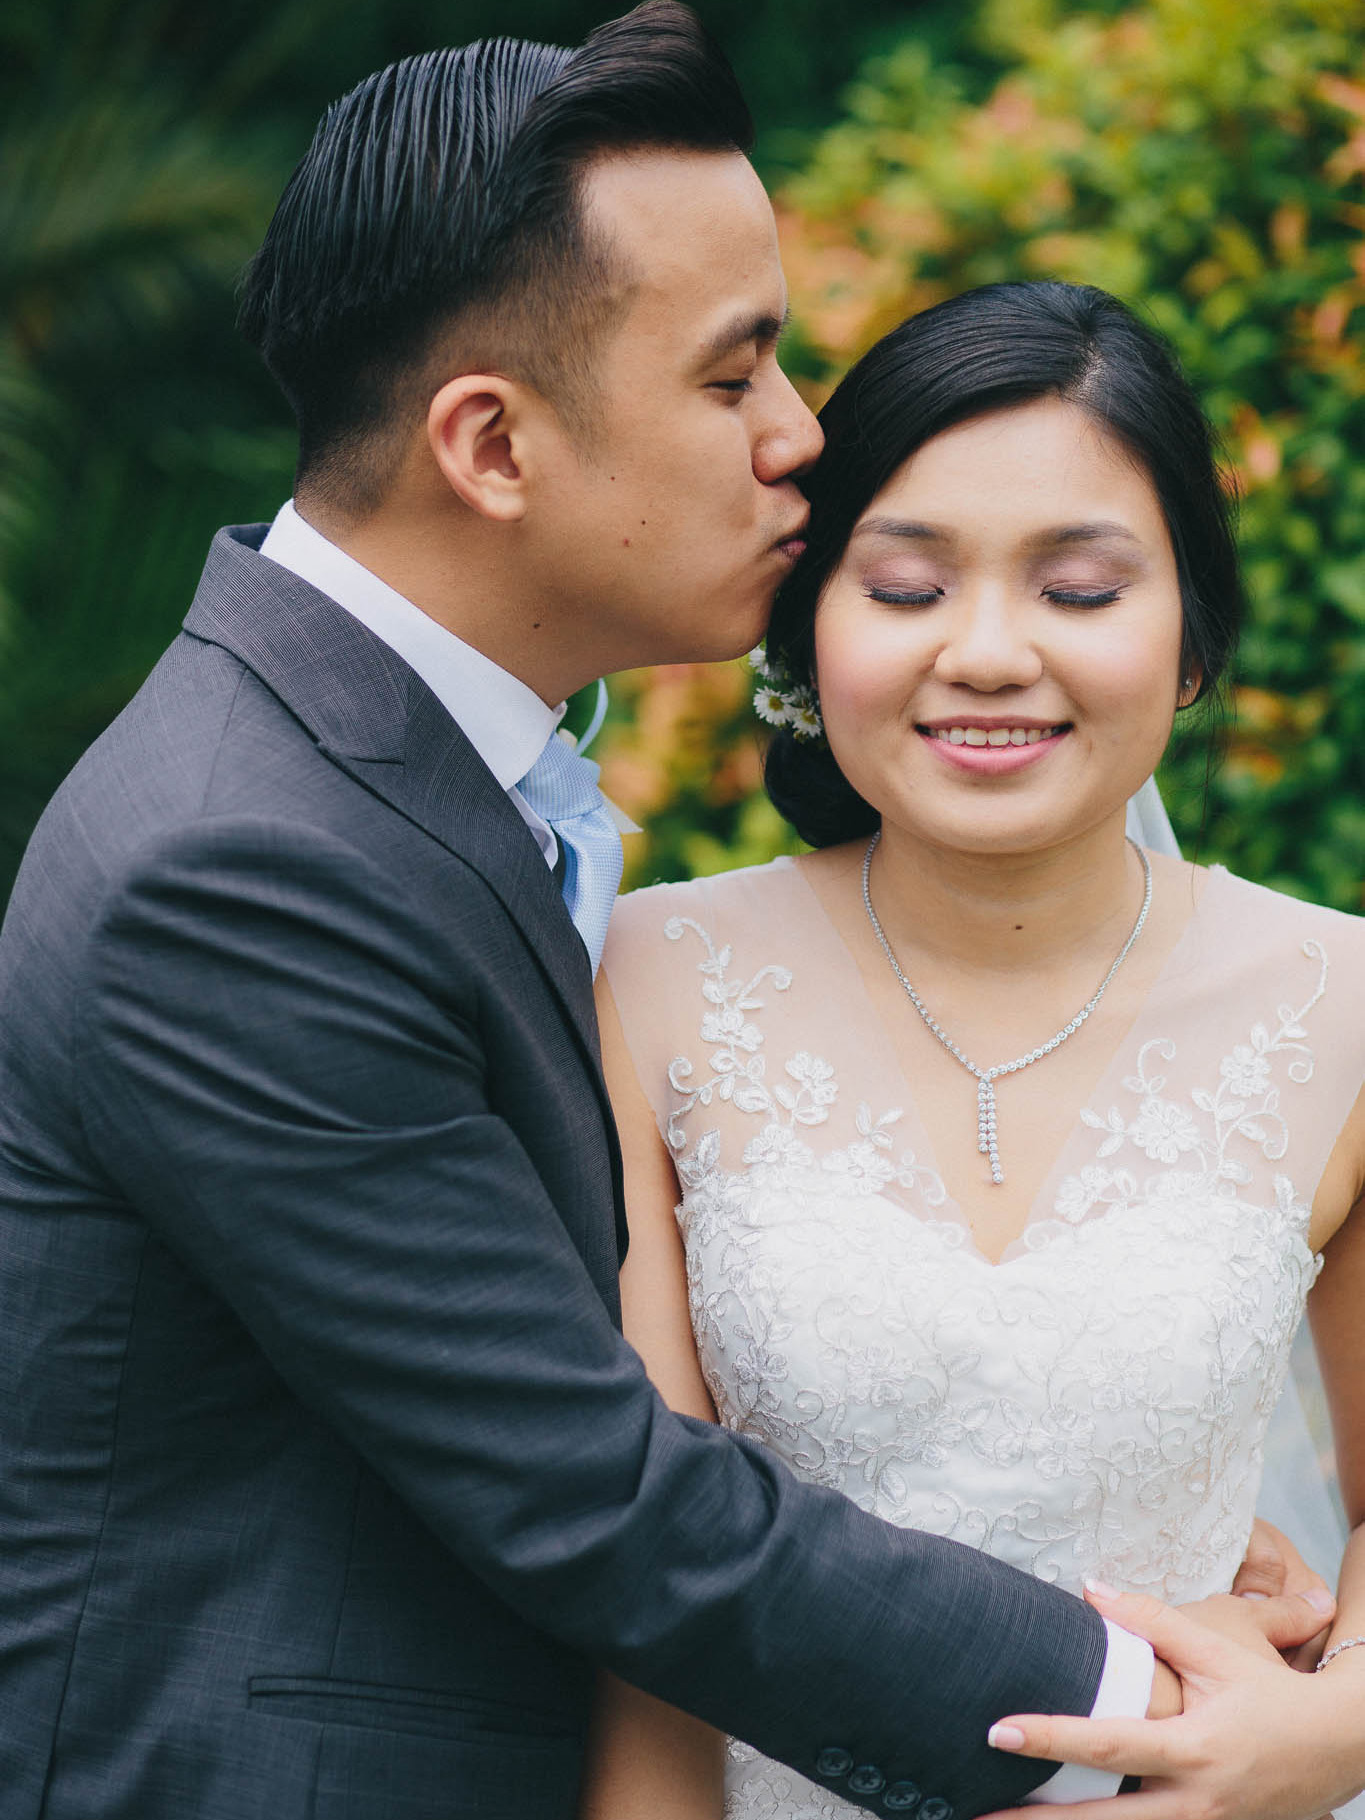 singapore-wedding-photographer-malay-indian-pre-wedding-travel-wmt-2015-jeremy-larissa-53.jpg